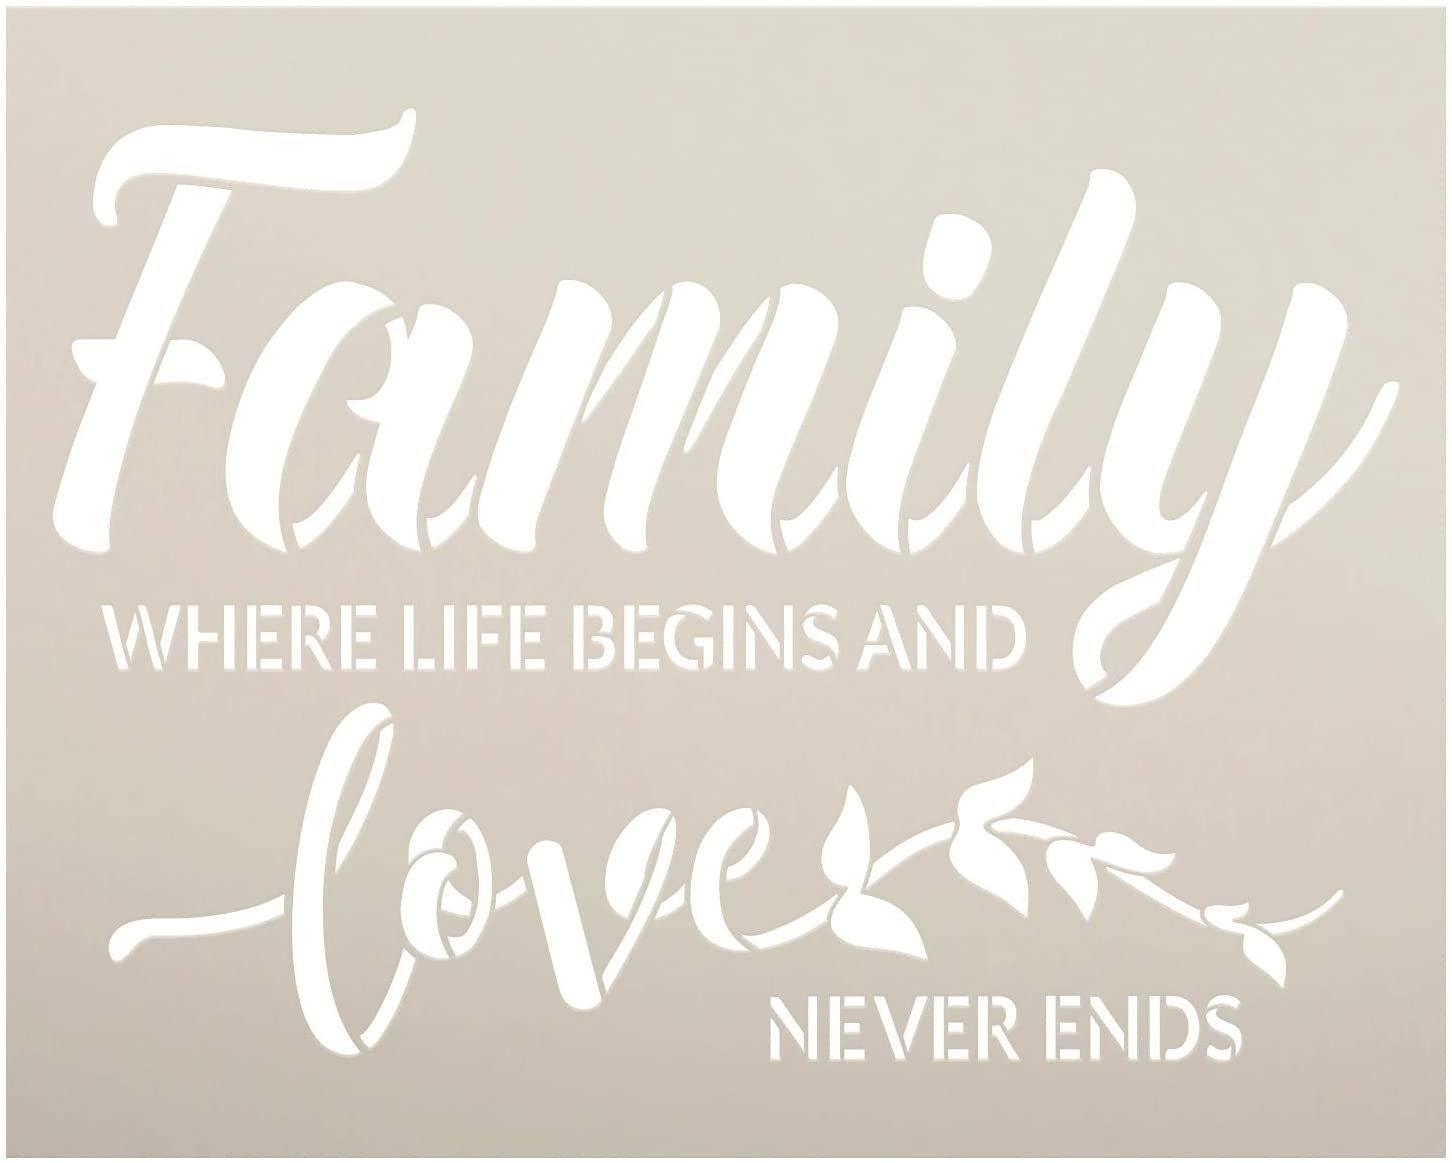 Family - Life Begins Love Never Ends Stencil by StudioR12 | DIY Home Decor | Craft & Paint Wood Sign | Reusable Mylar Template | Cursive Script Laurel Gift | Select Size